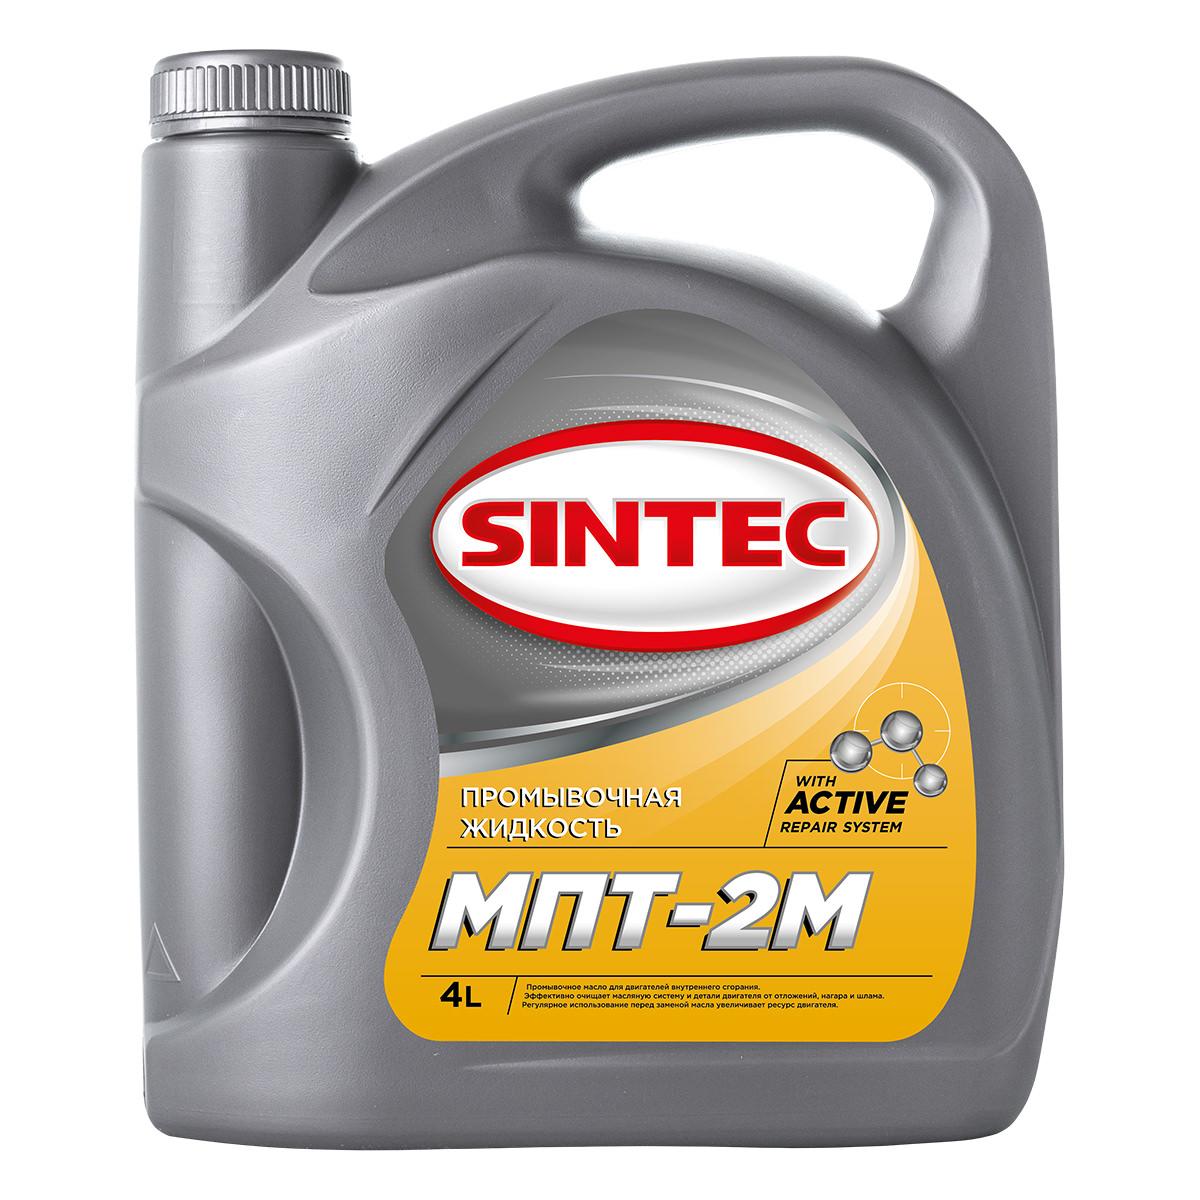 Sintec МПТ-2М